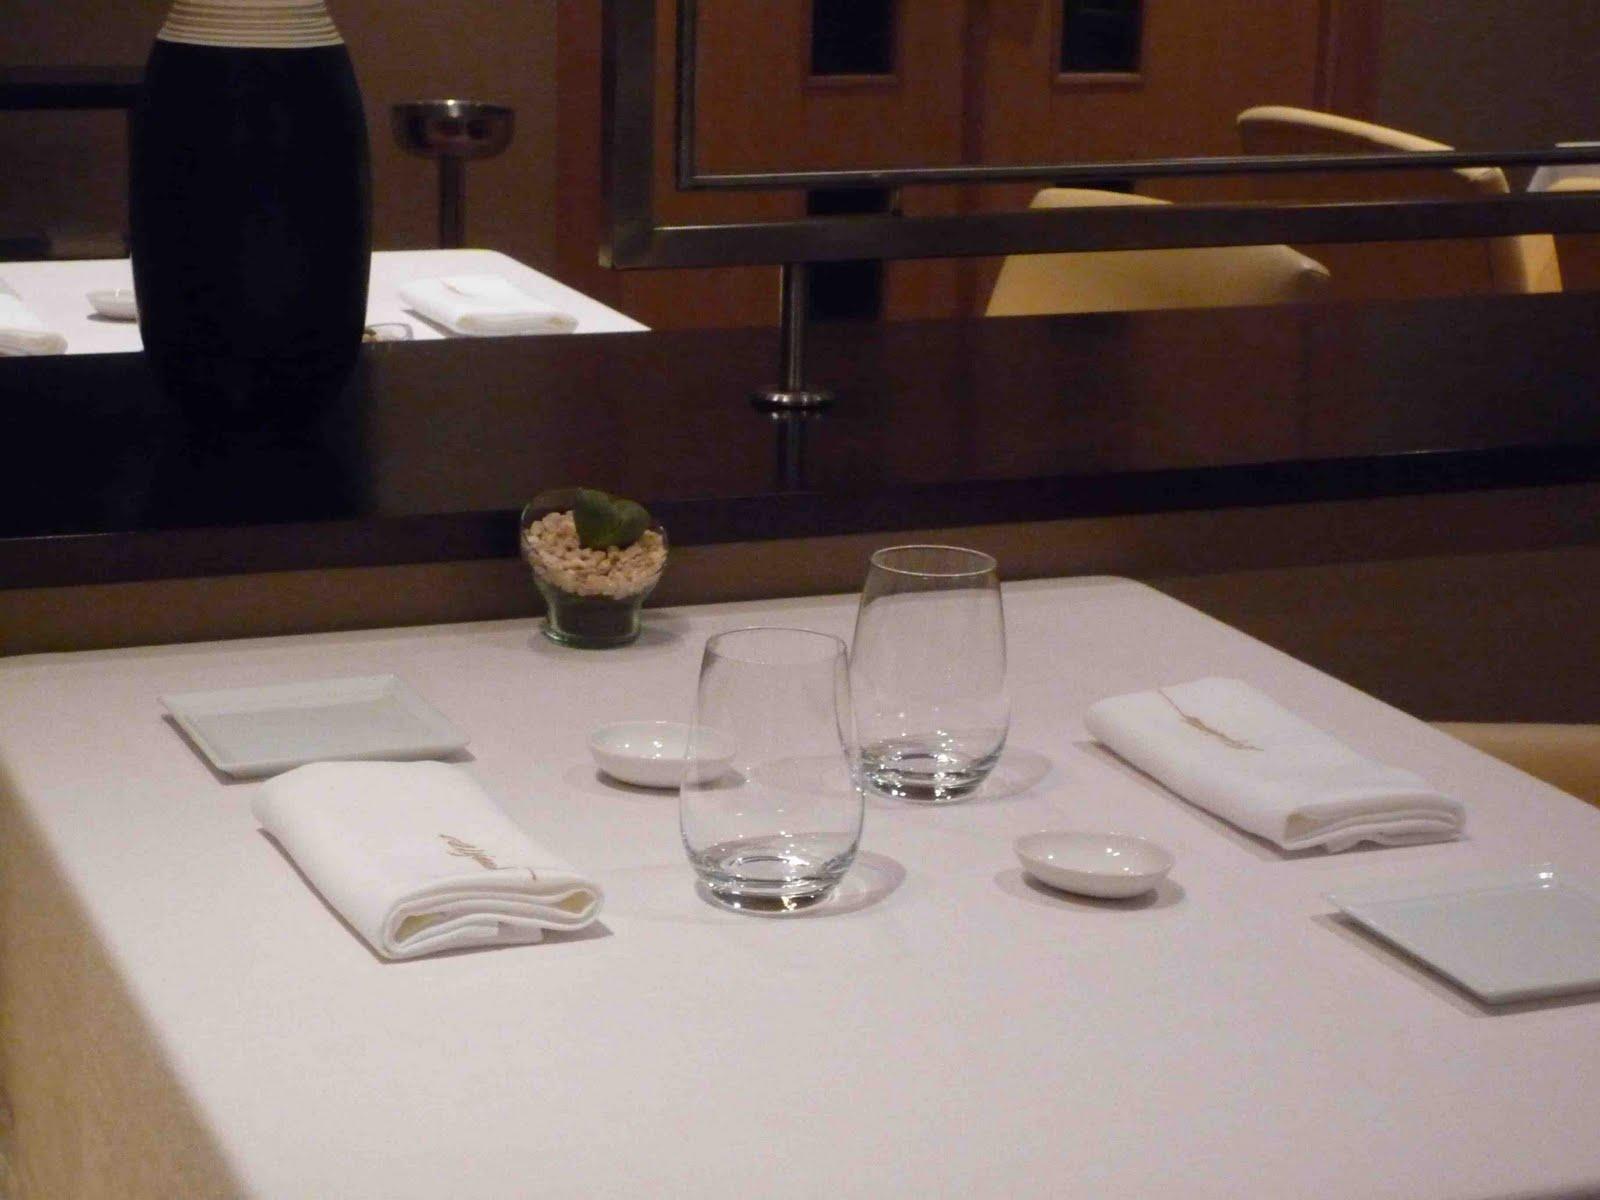 Mis restaurantes restaurante alejandro for Menaje de cocina para restaurante